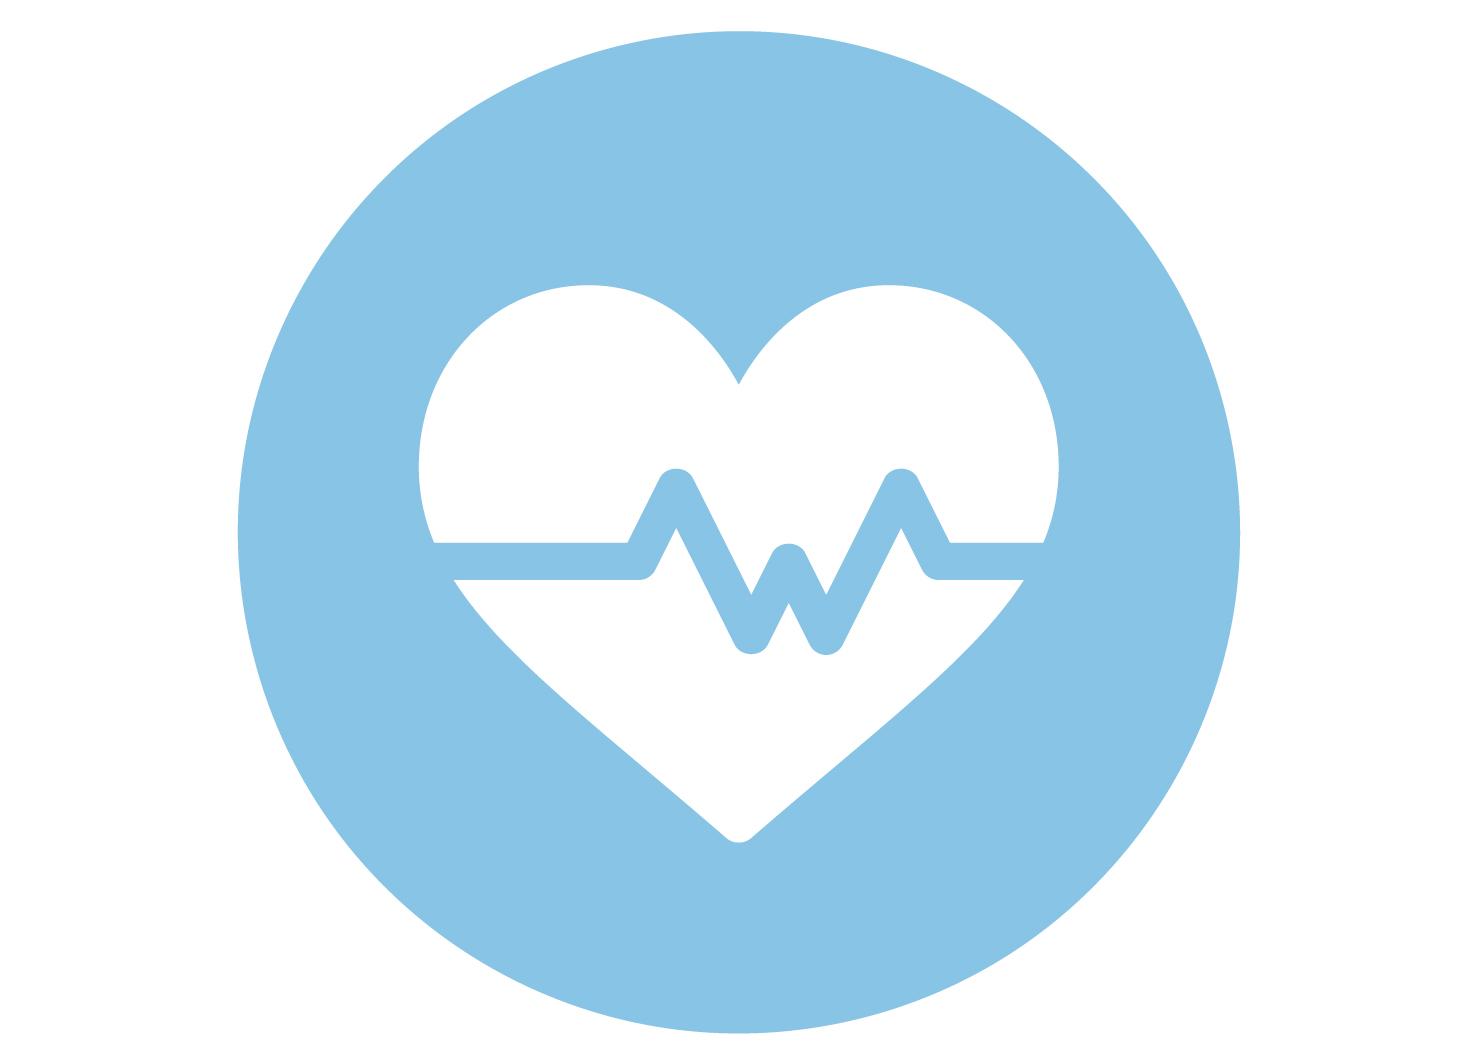 salescandy-lms-industry-health-wellness.jpg